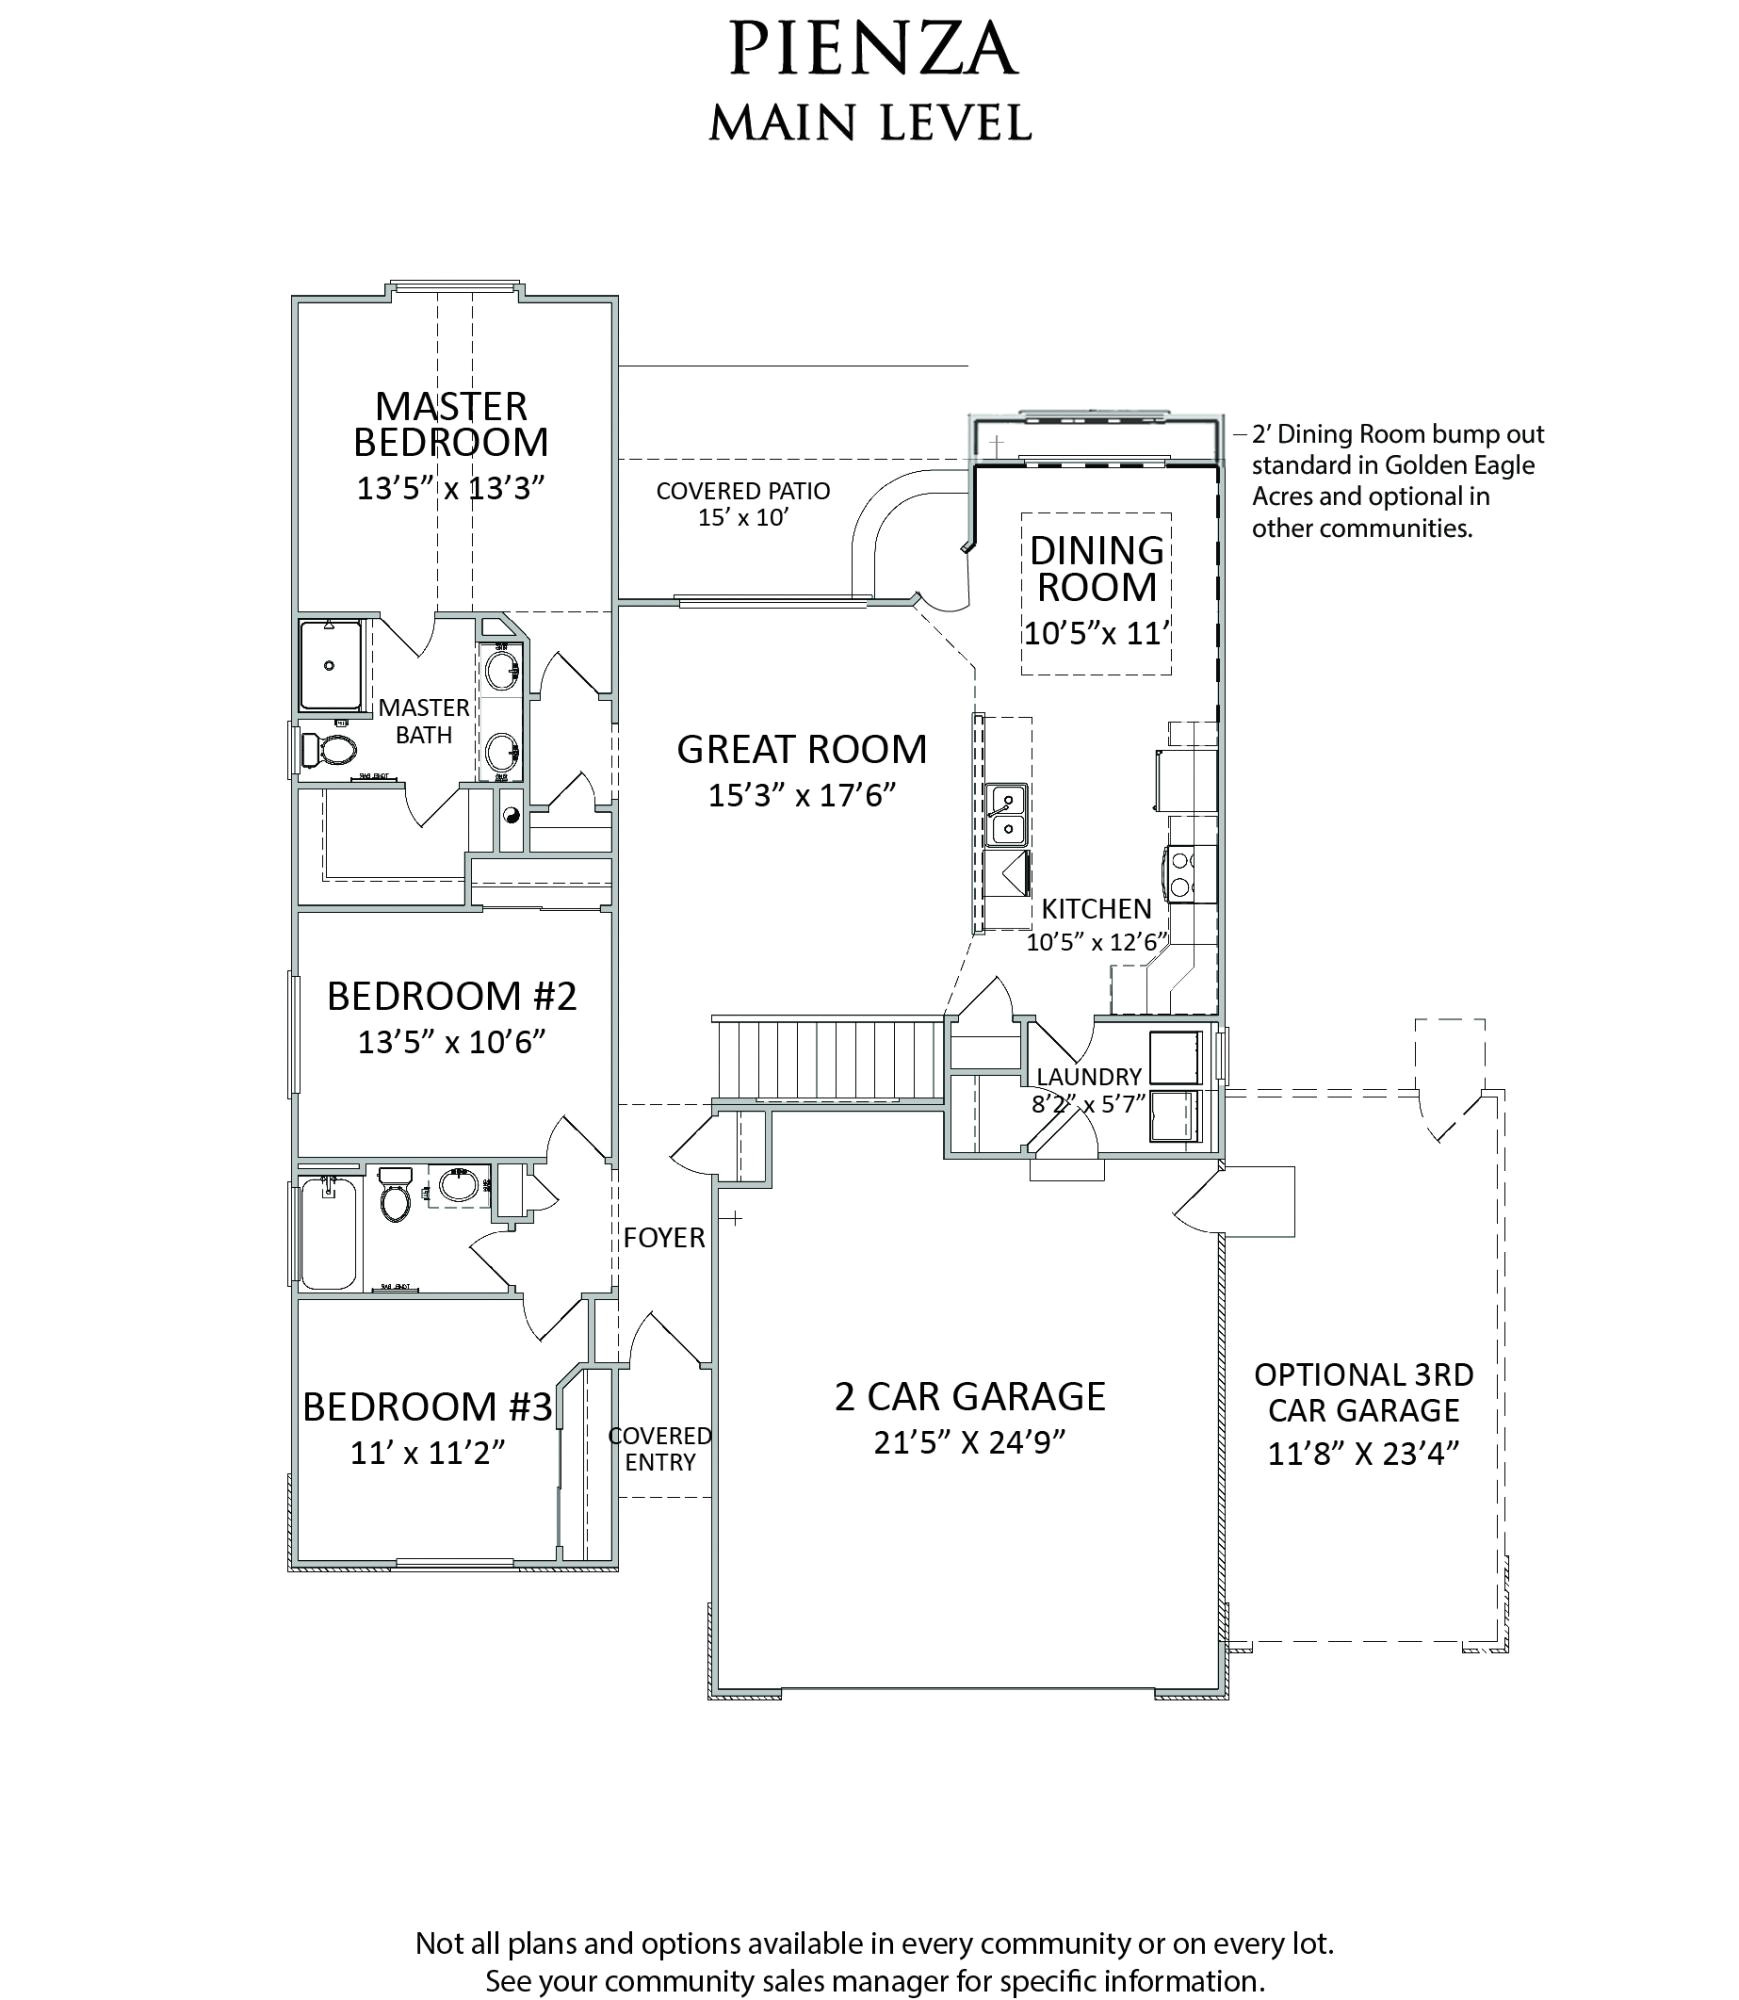 home wiring plan software making wiring plans easily 4